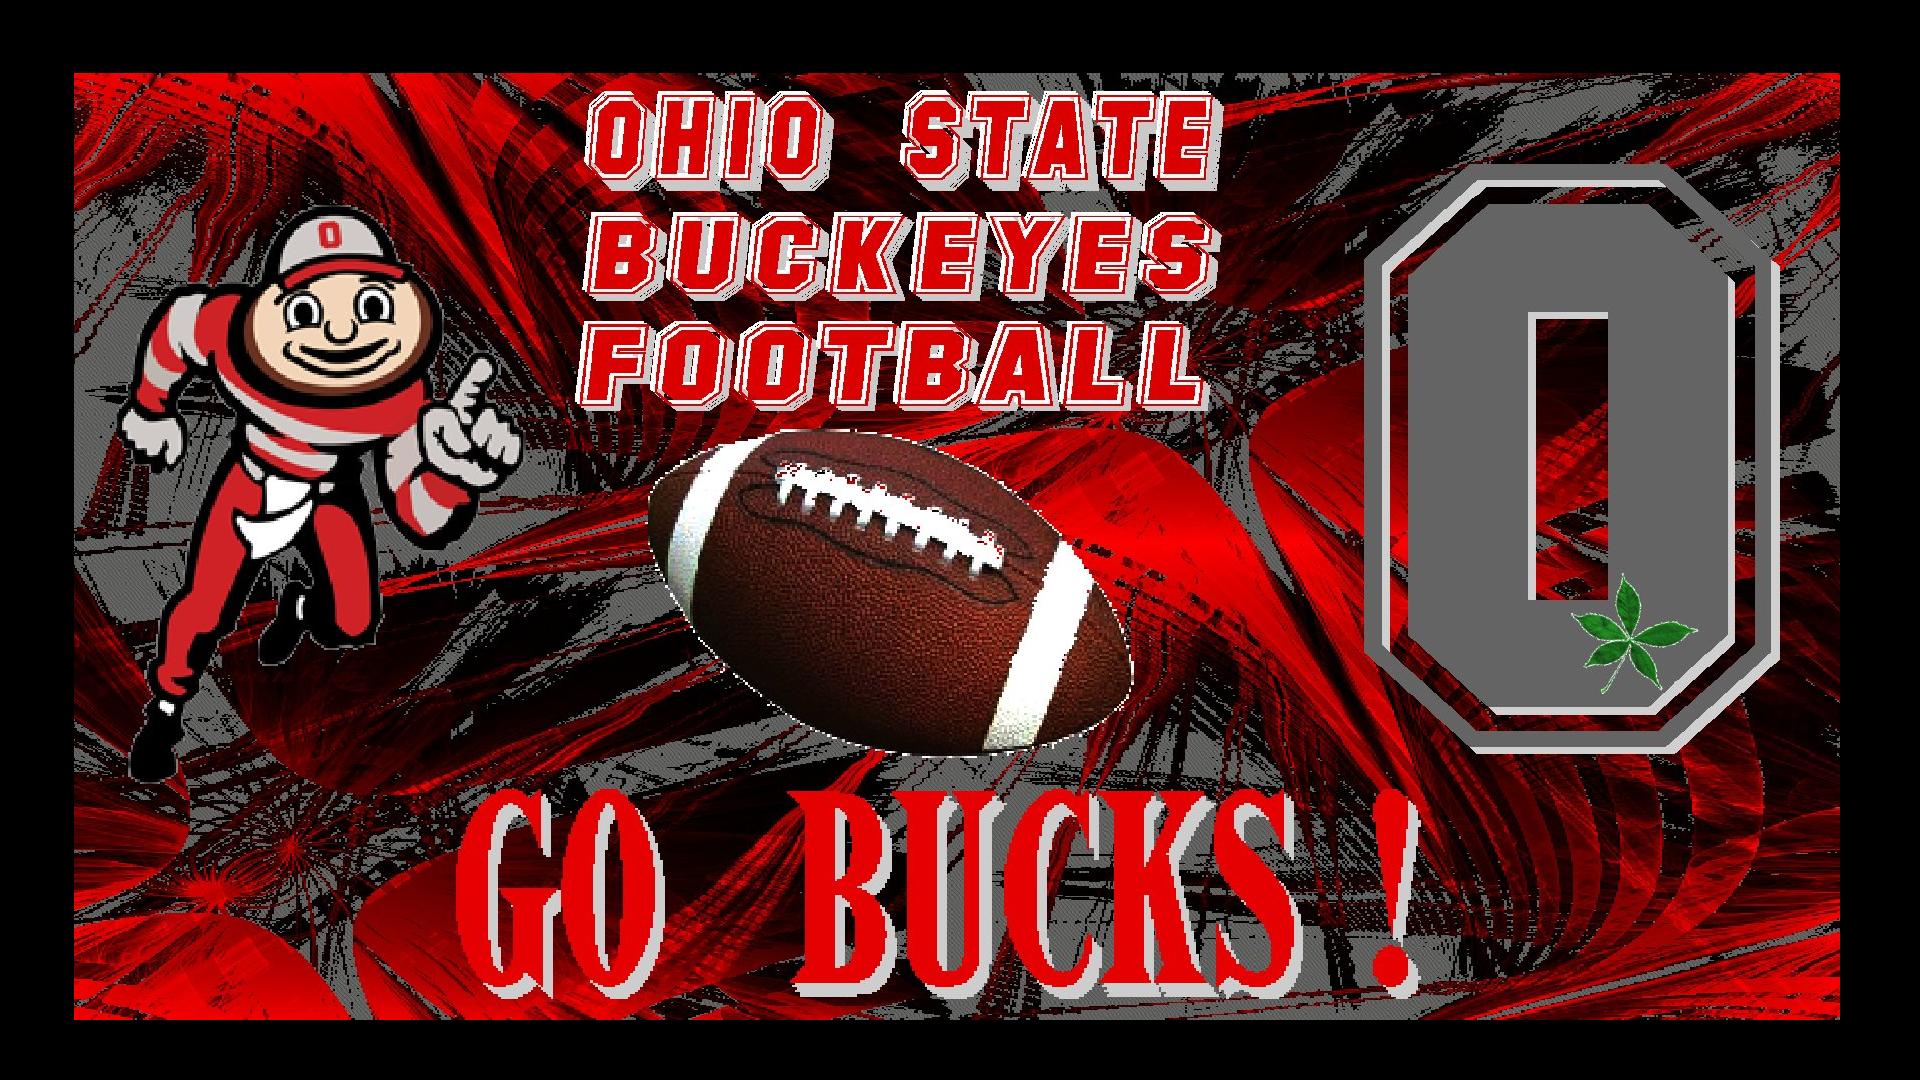 OHIO STATE BUCKEYES FOOTBALL GO BUCKS ohio state football 29030008 1920x1080